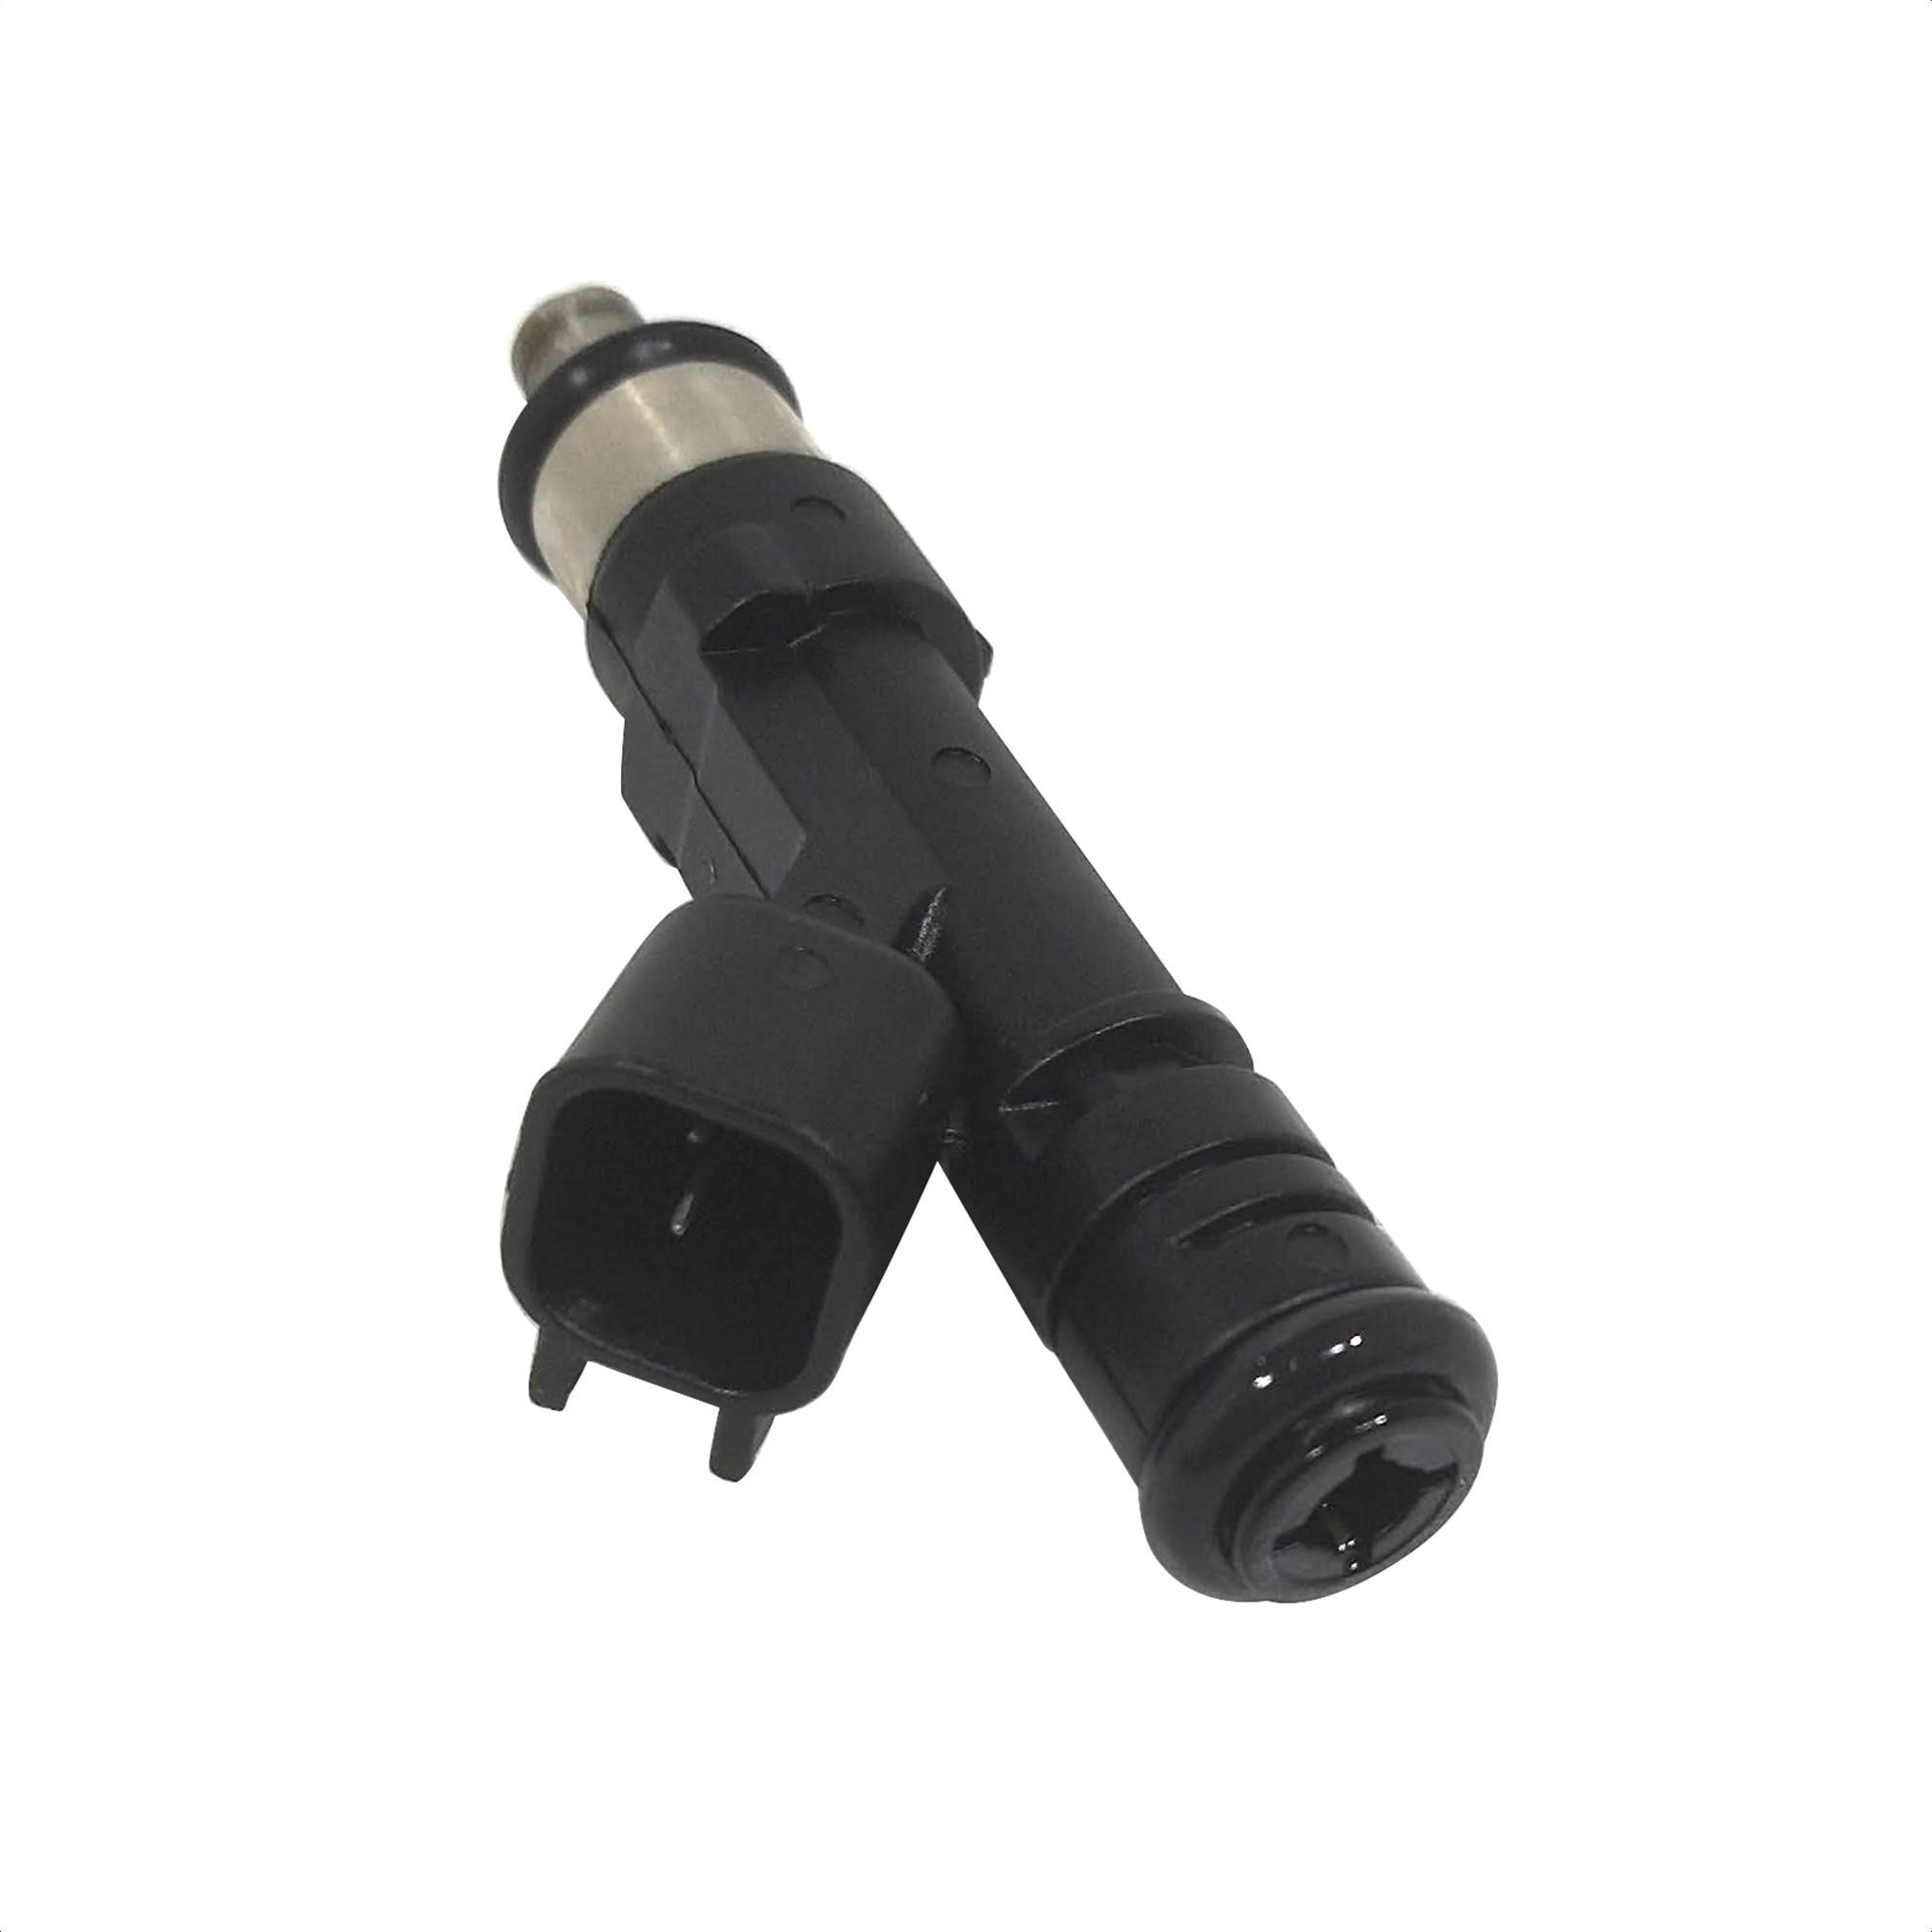 Inyector Fispa Fi-0280158179 Ford Focus